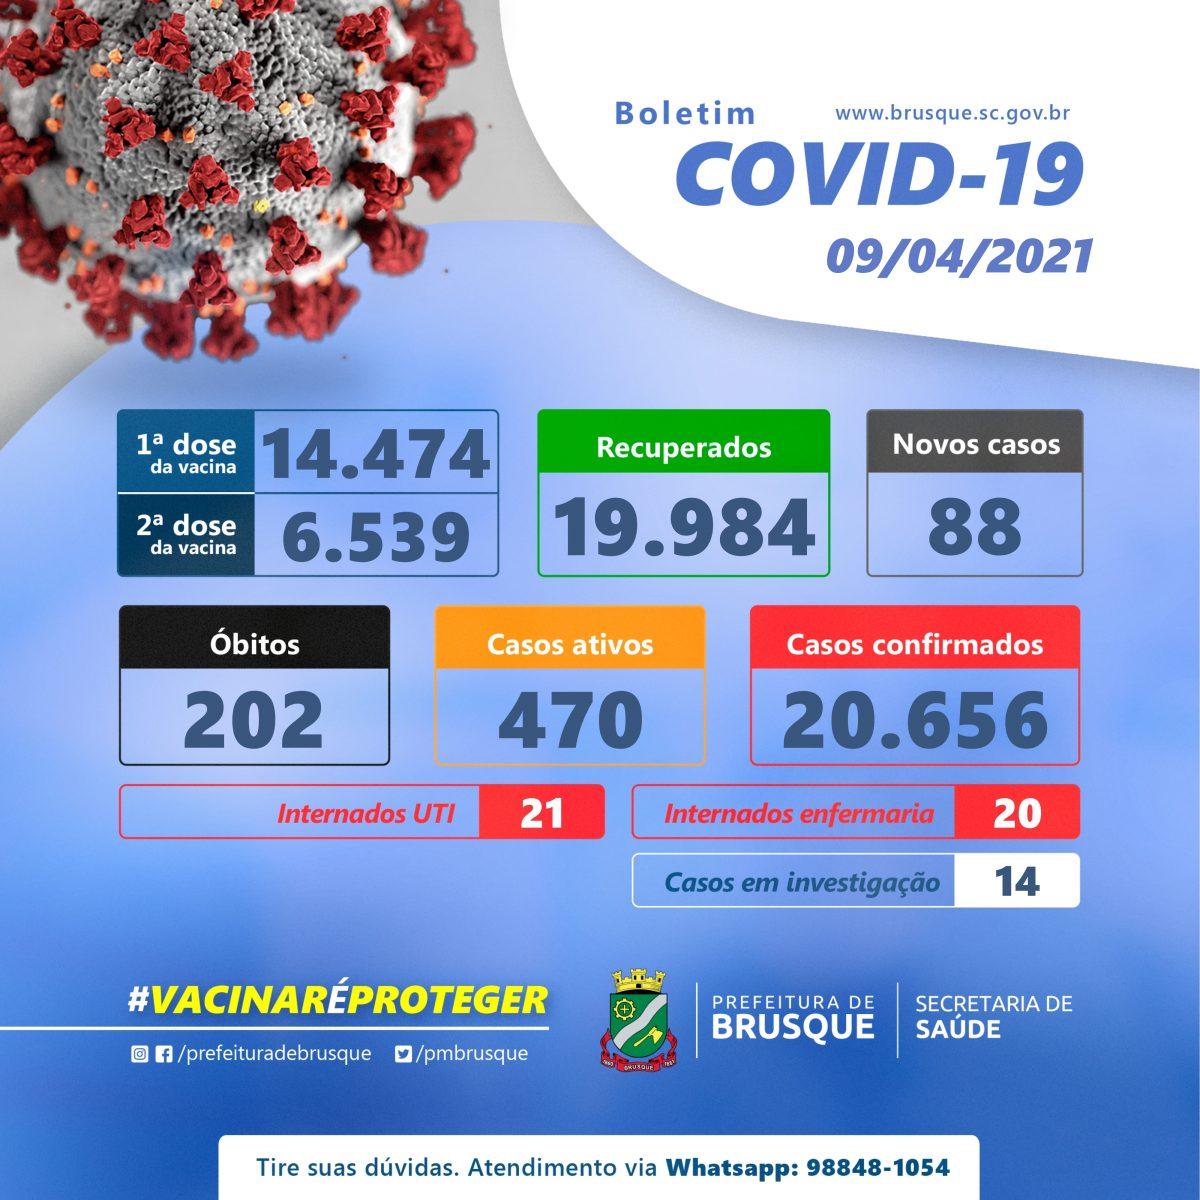 Covid 19: Confira o boletim epidemiológico desta sexta-feira (09)